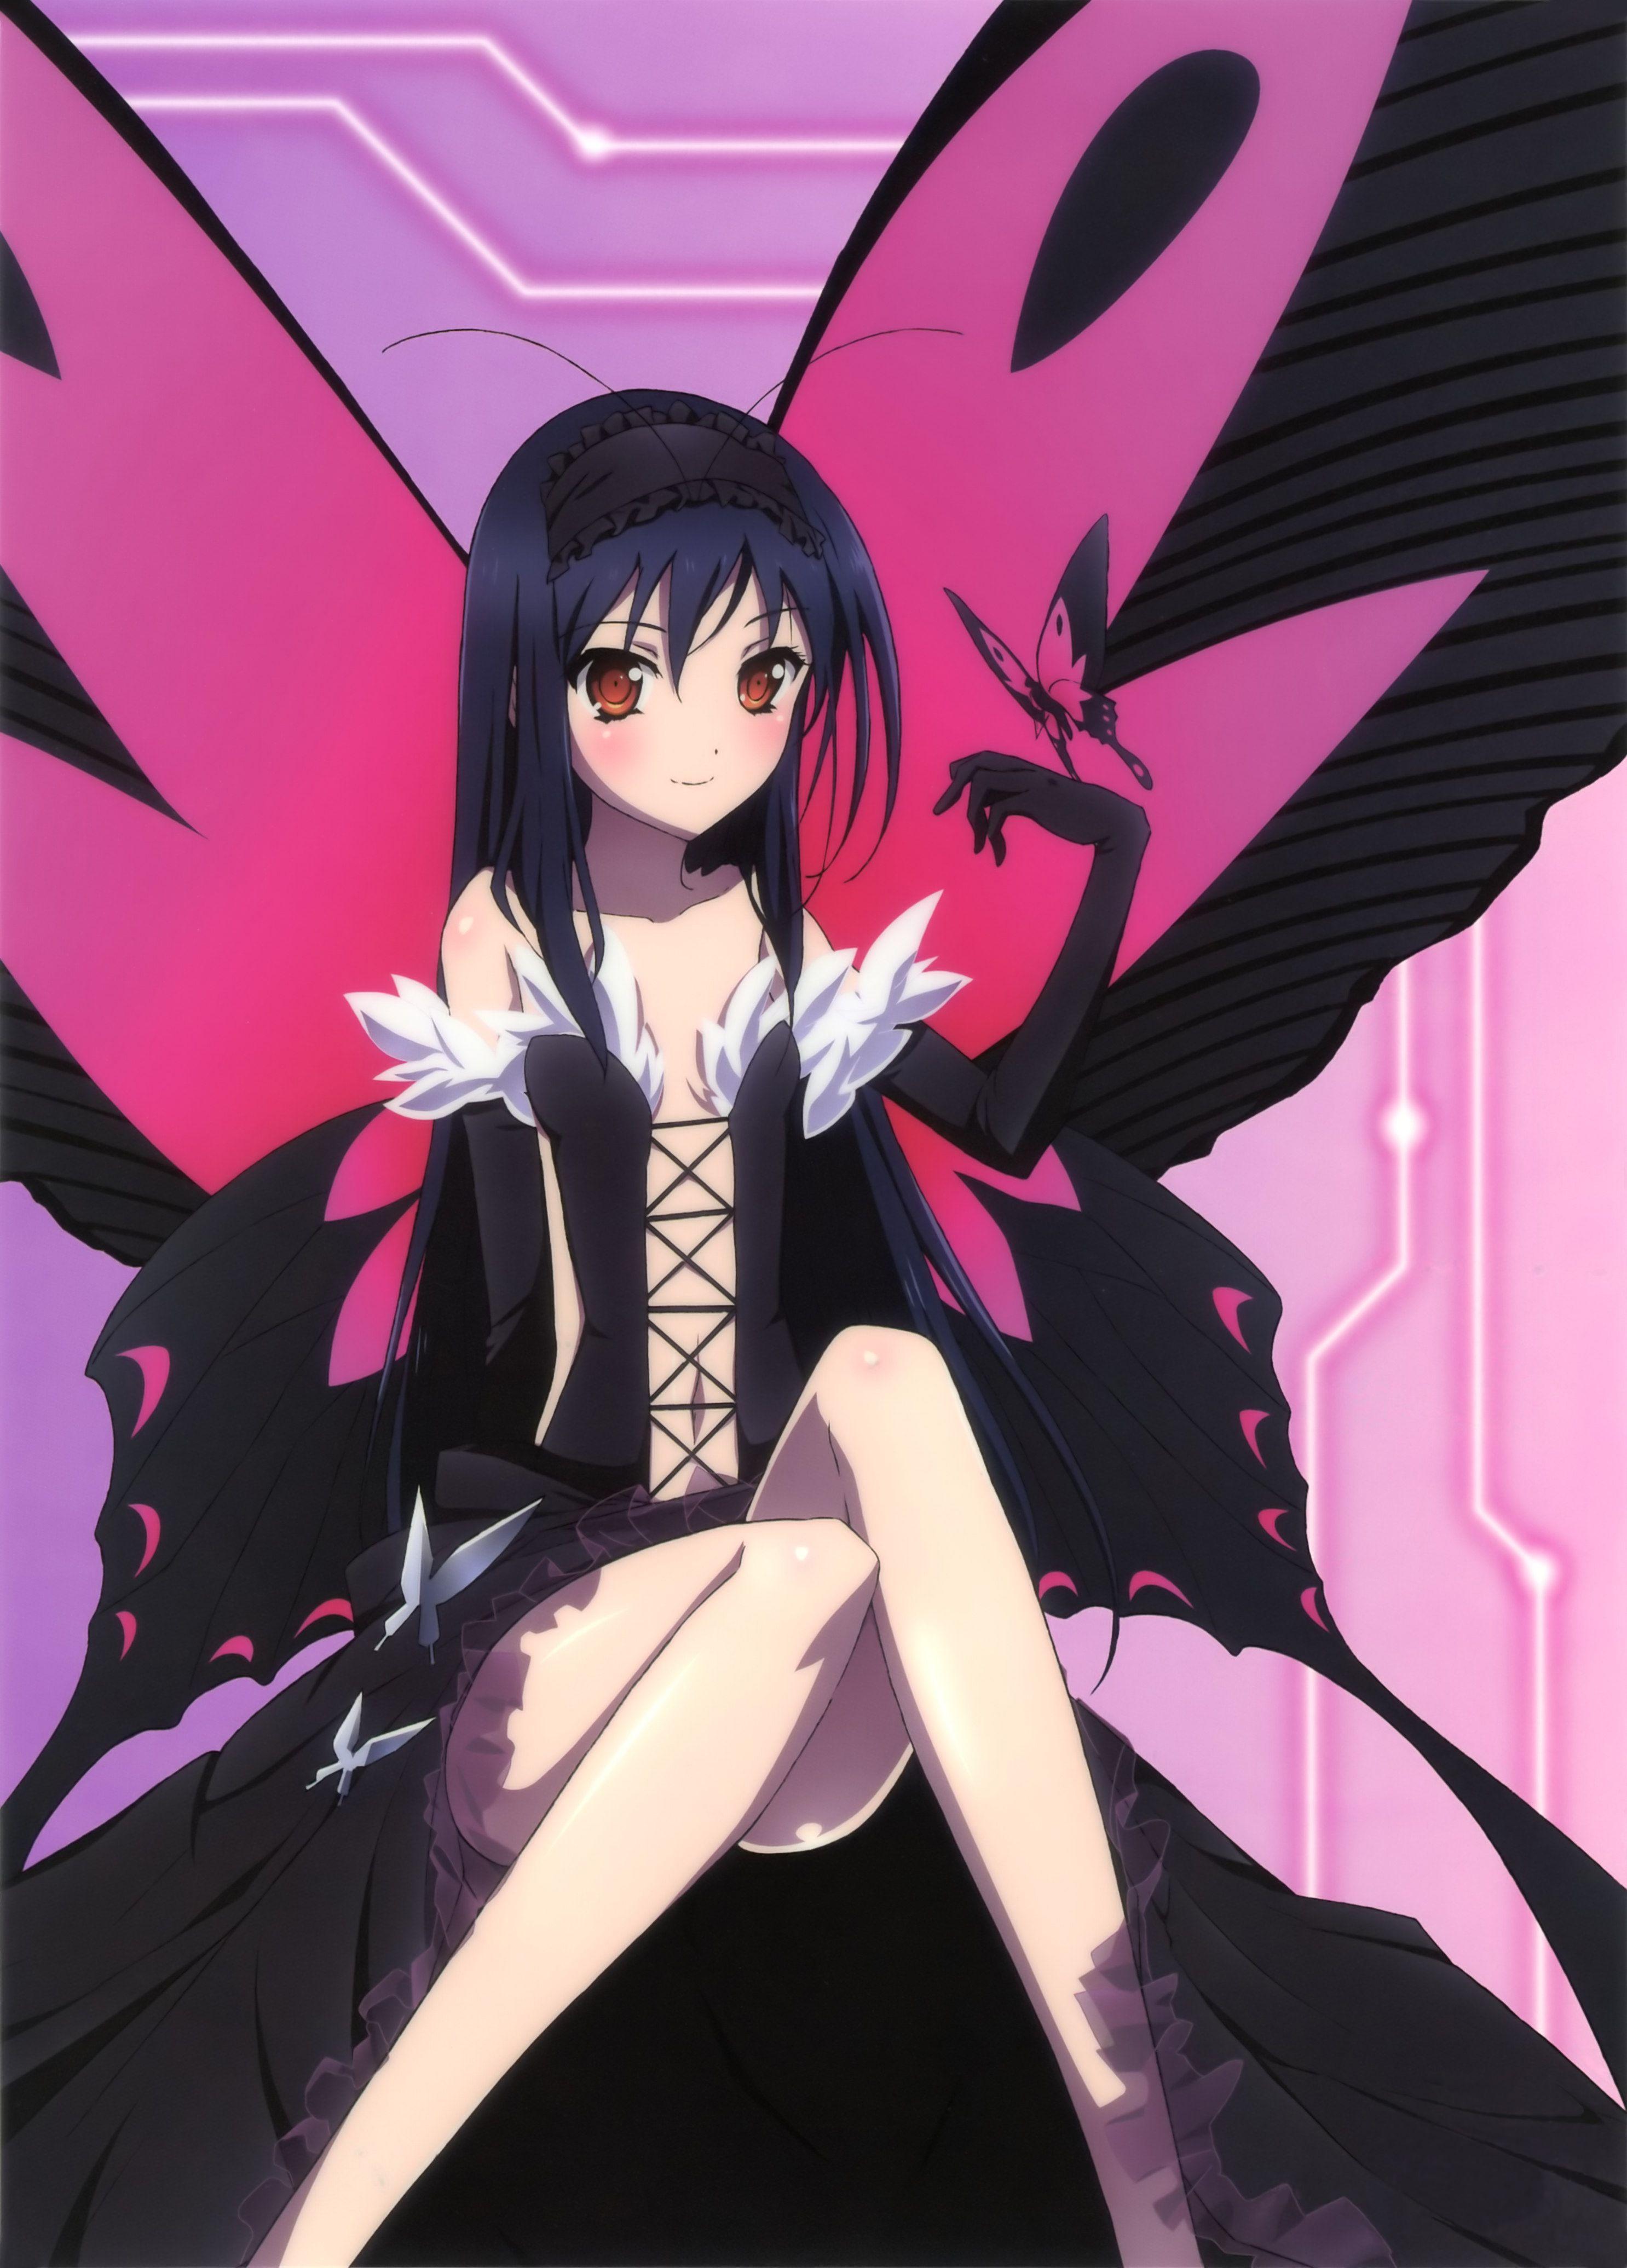 accel world Part 3 - NHTGEF/100 - Anime Image